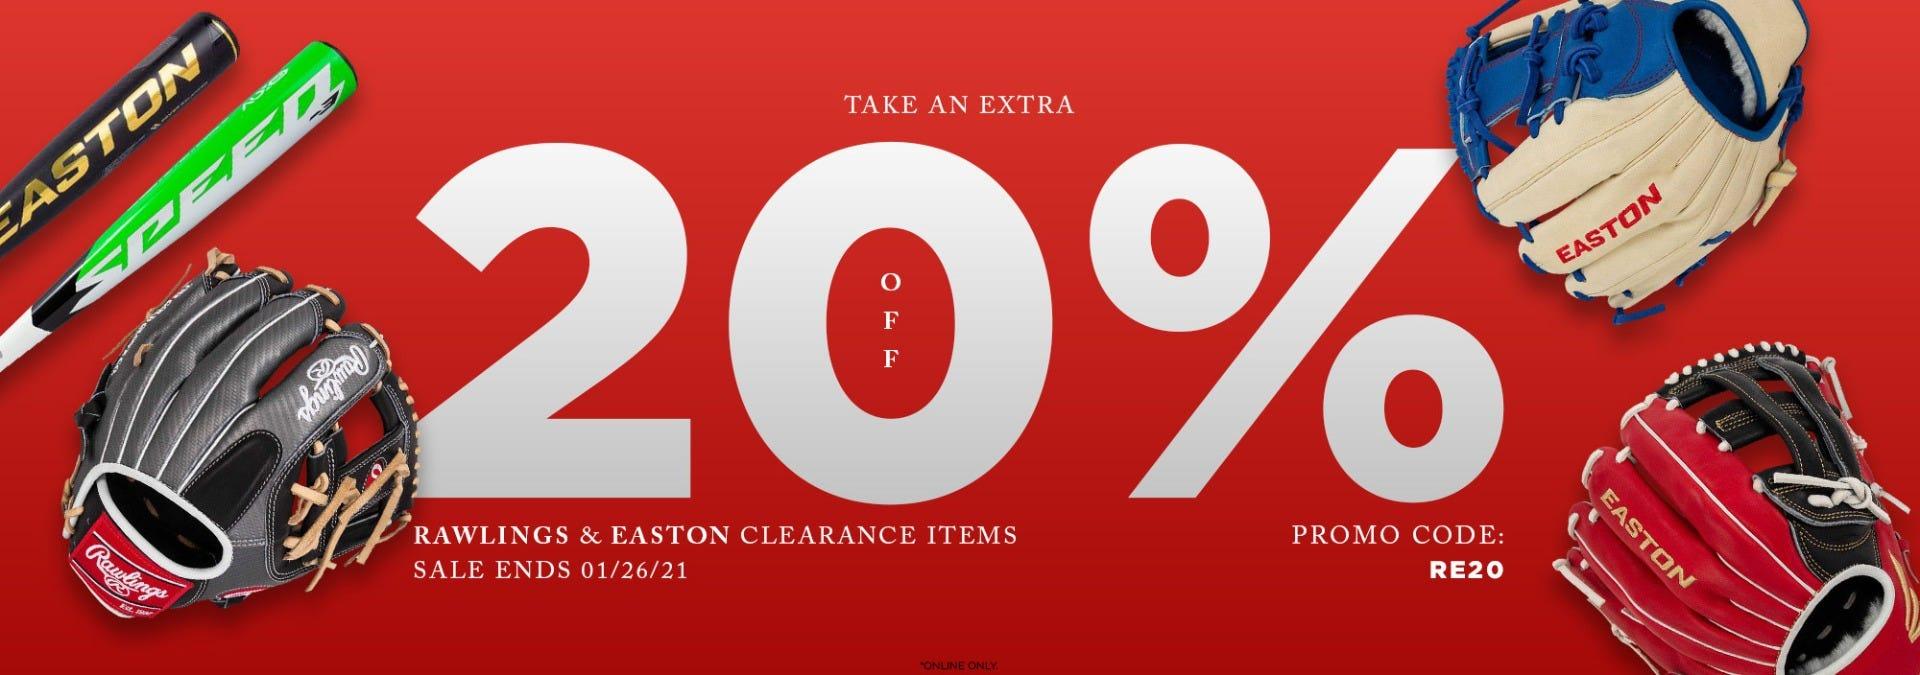 20% Off Clearance Easton & Rawlings